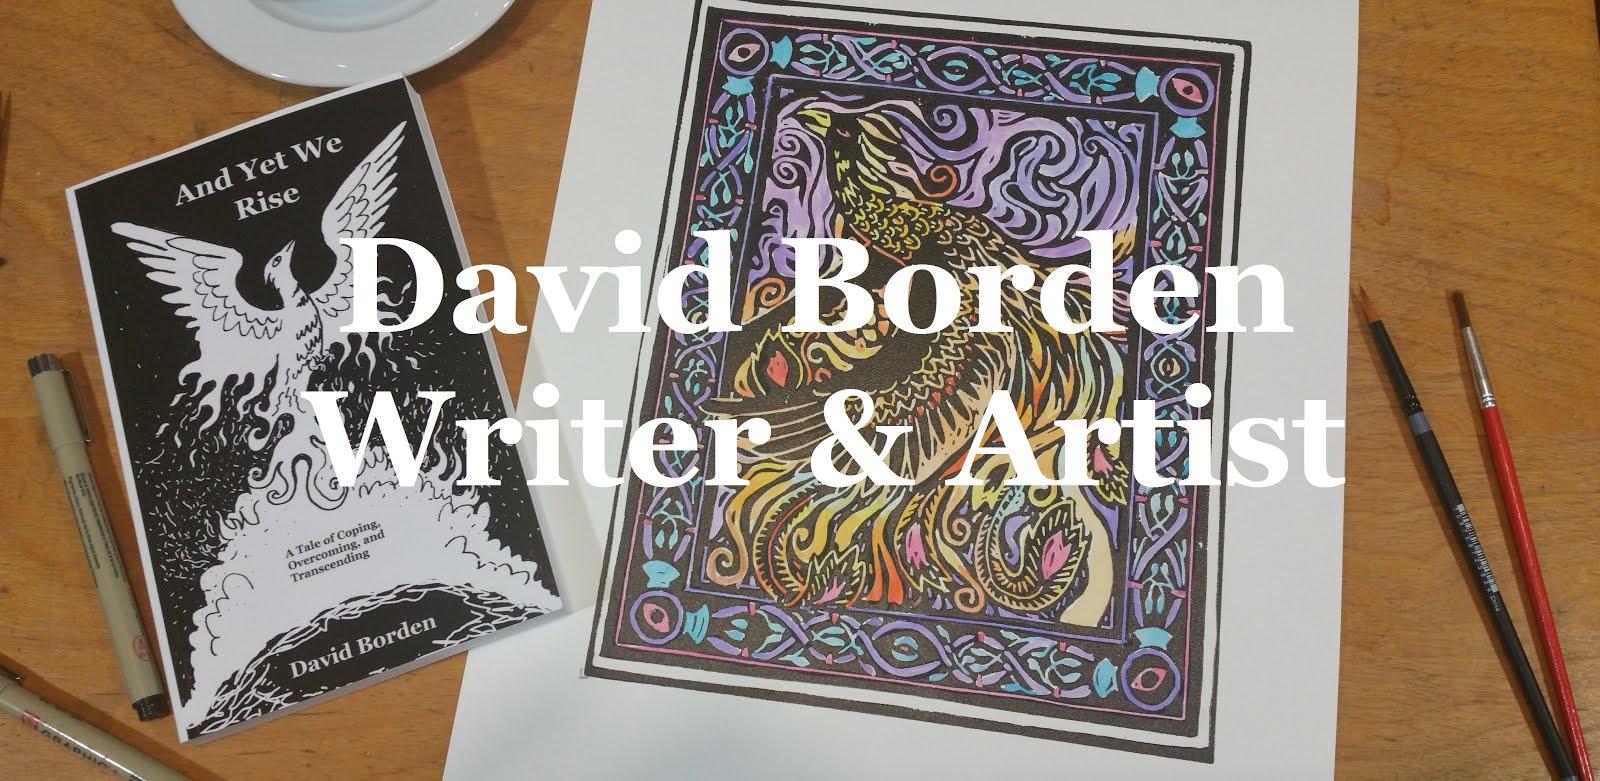 D S Borden: Award Winning Artist and Writer